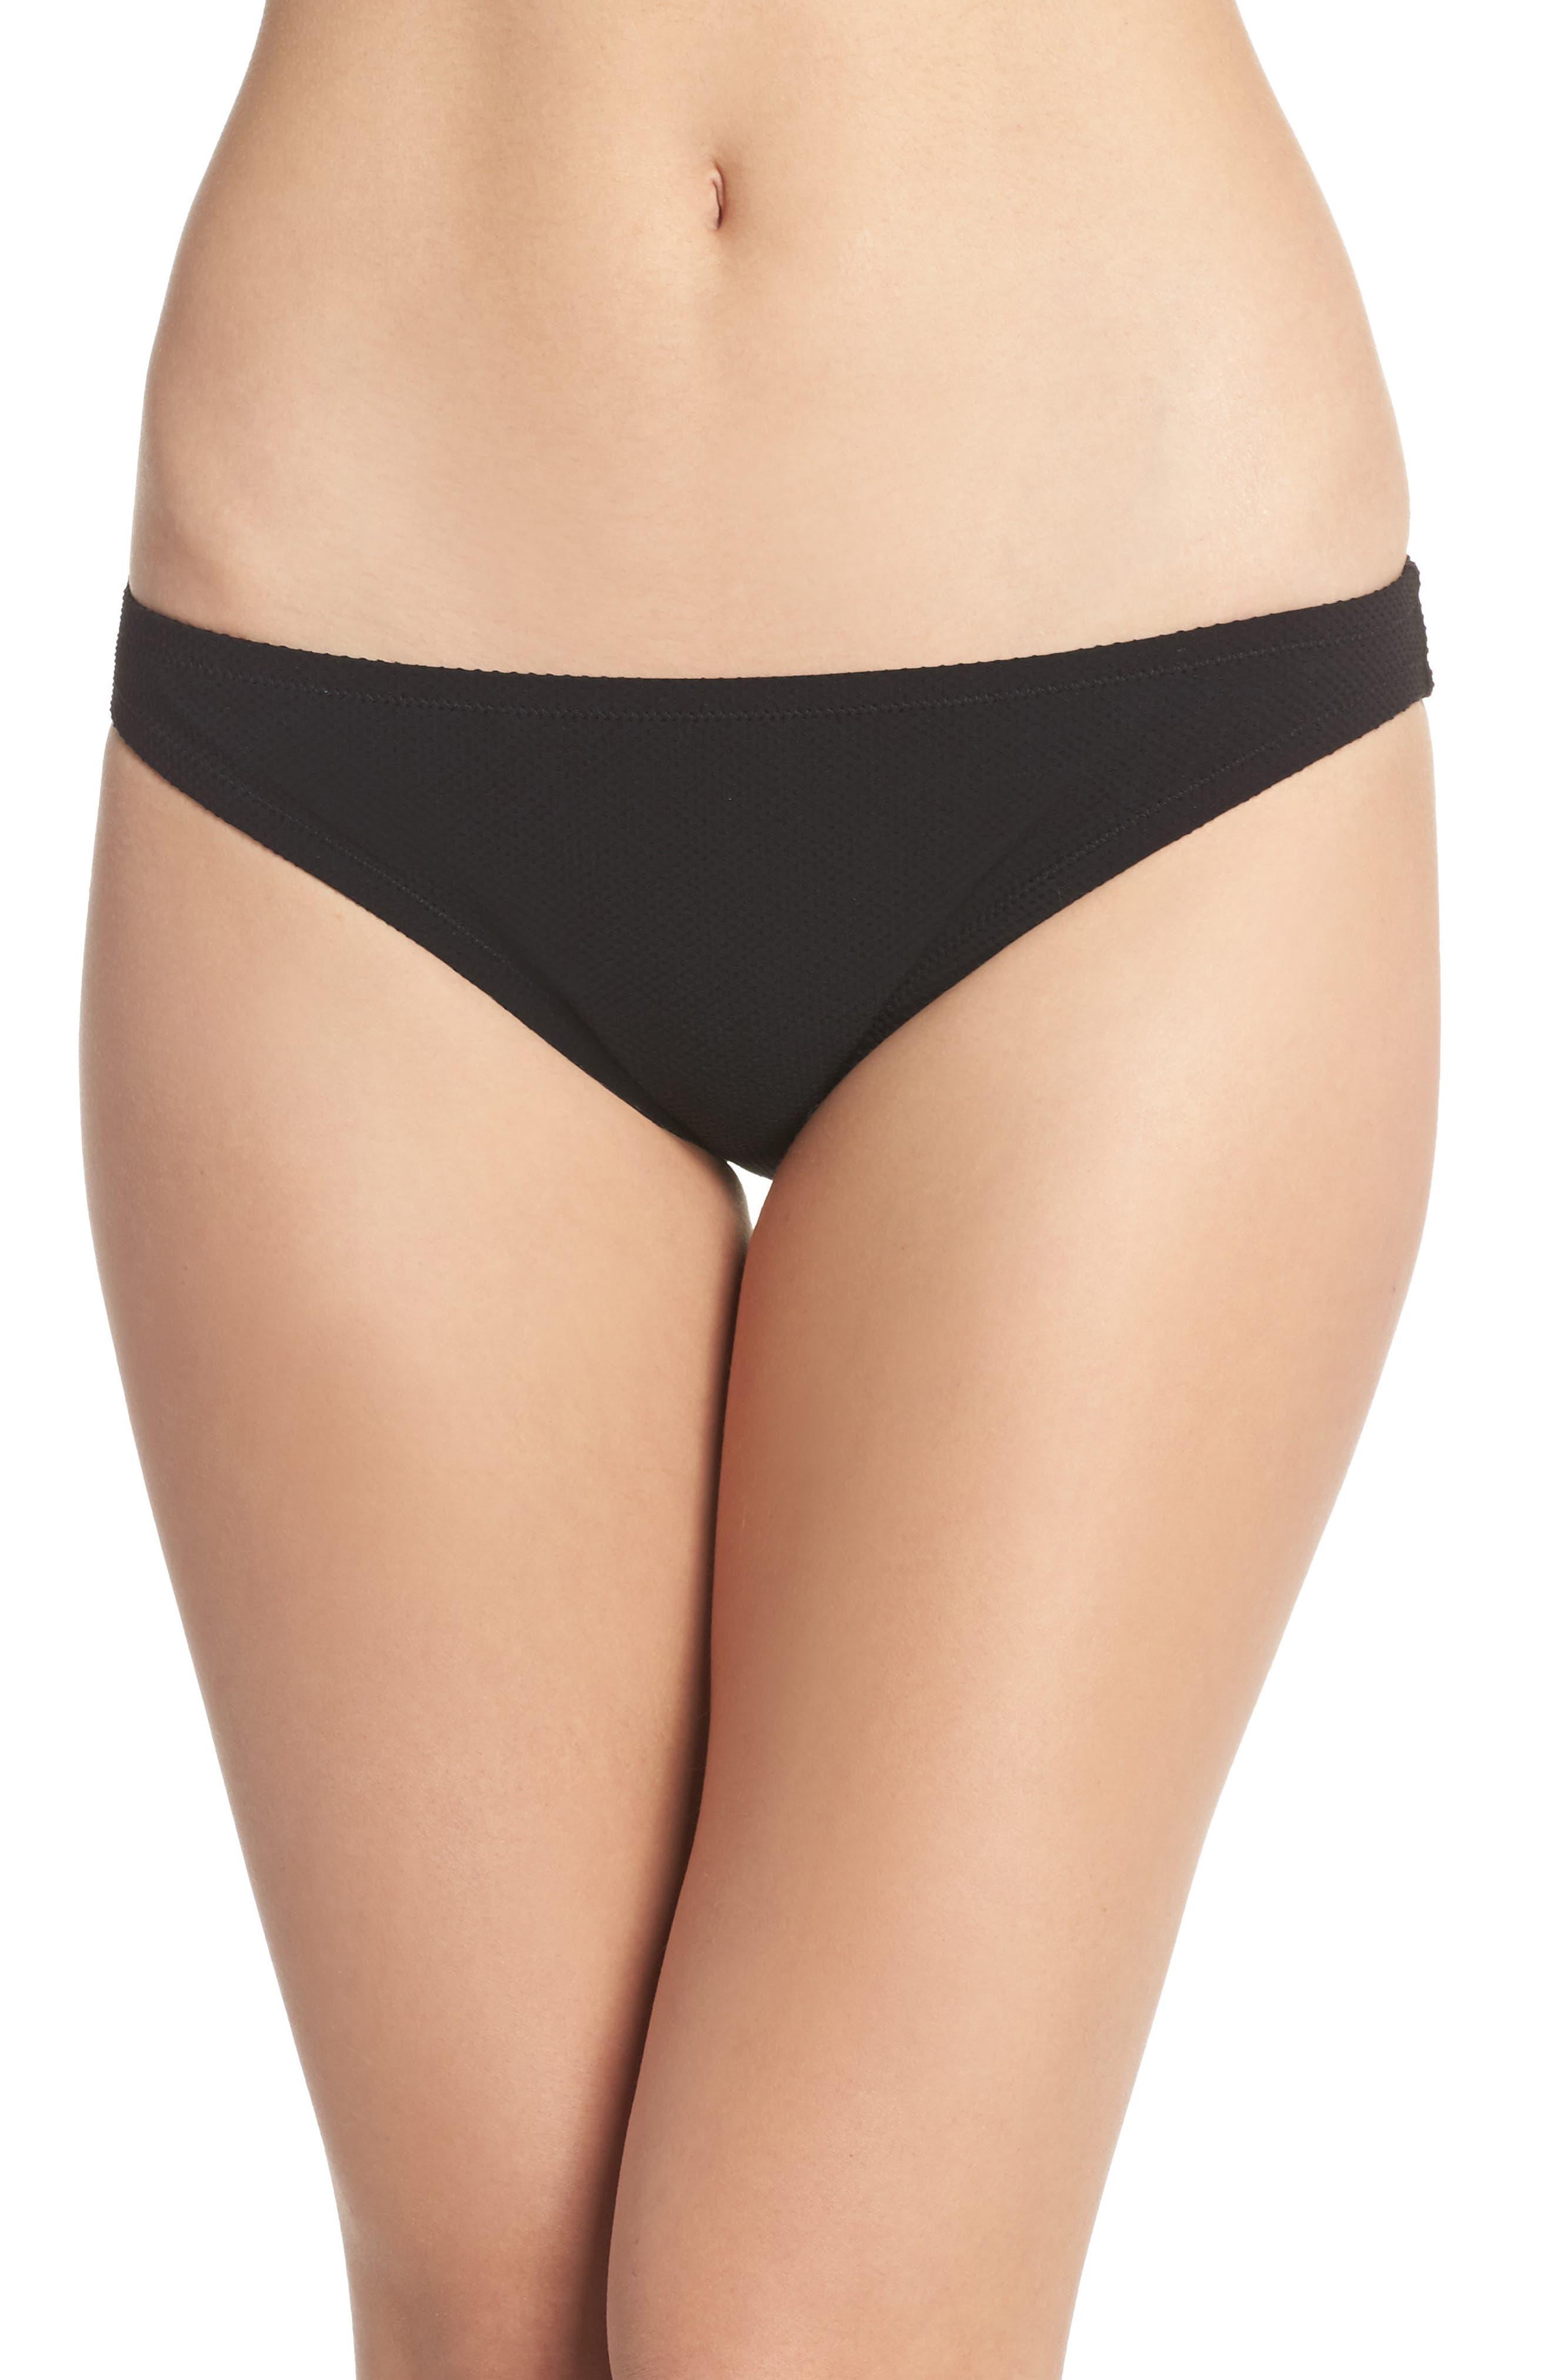 J.Crew Piqué Hipster Bikini Bottoms,                         Main,                         color, Black